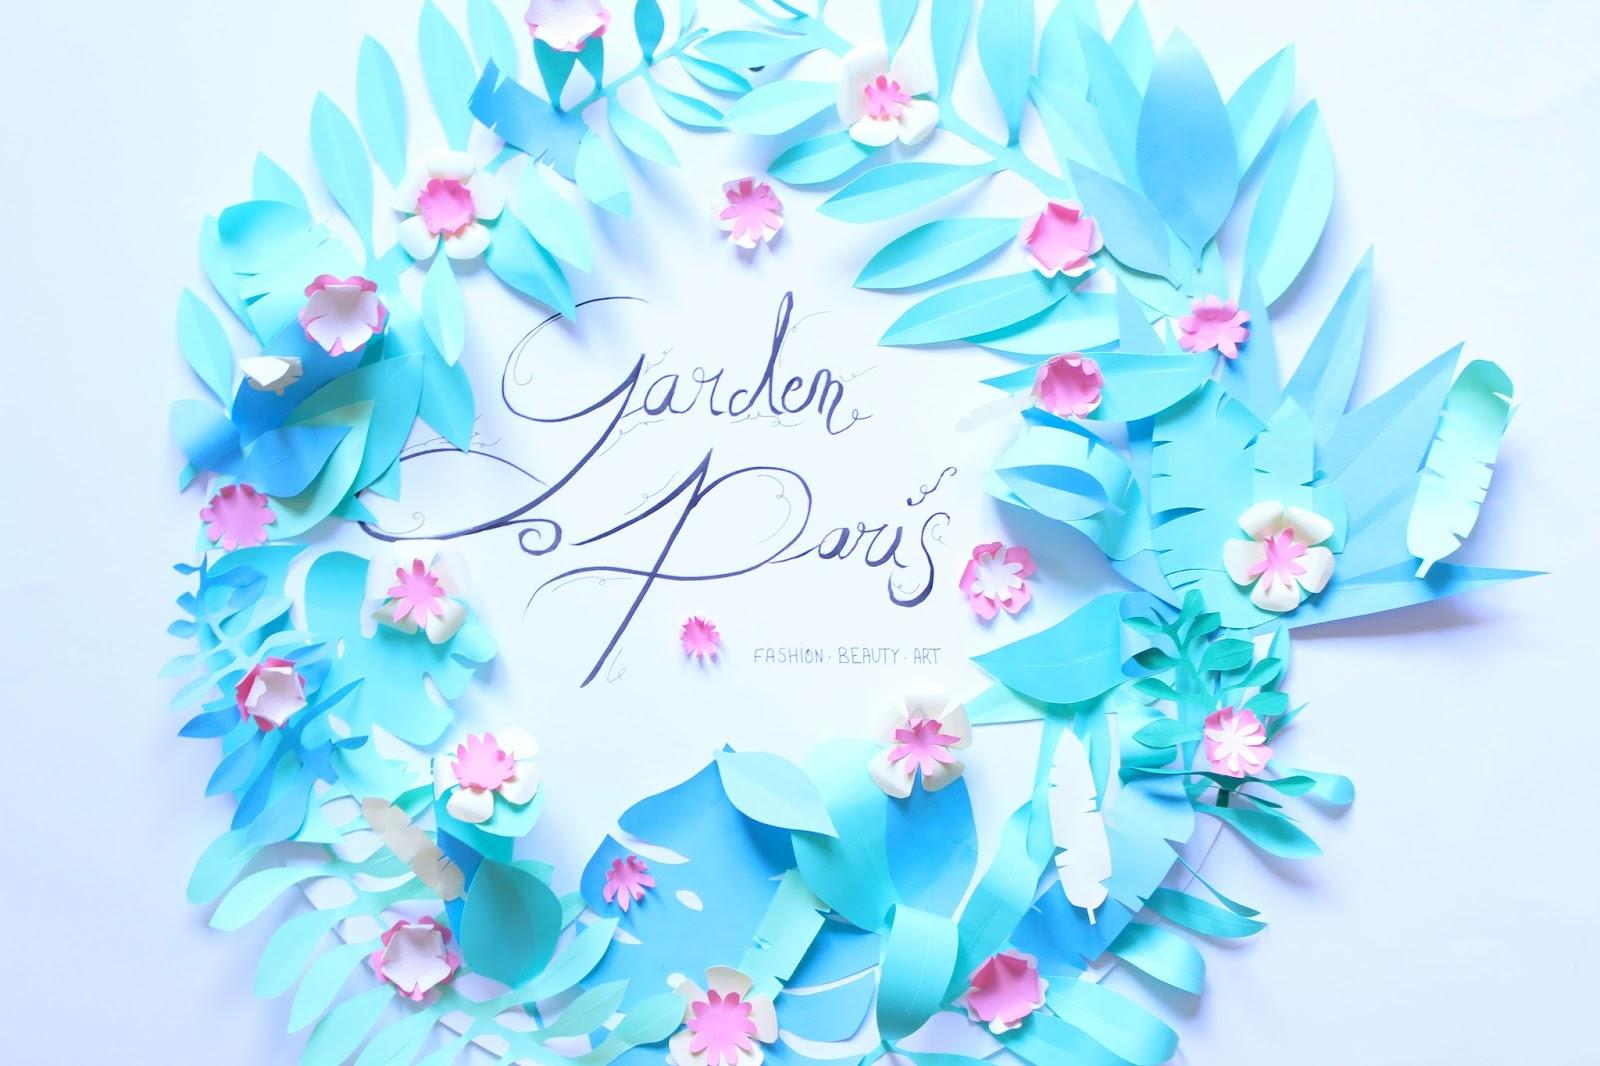 Garden Paris